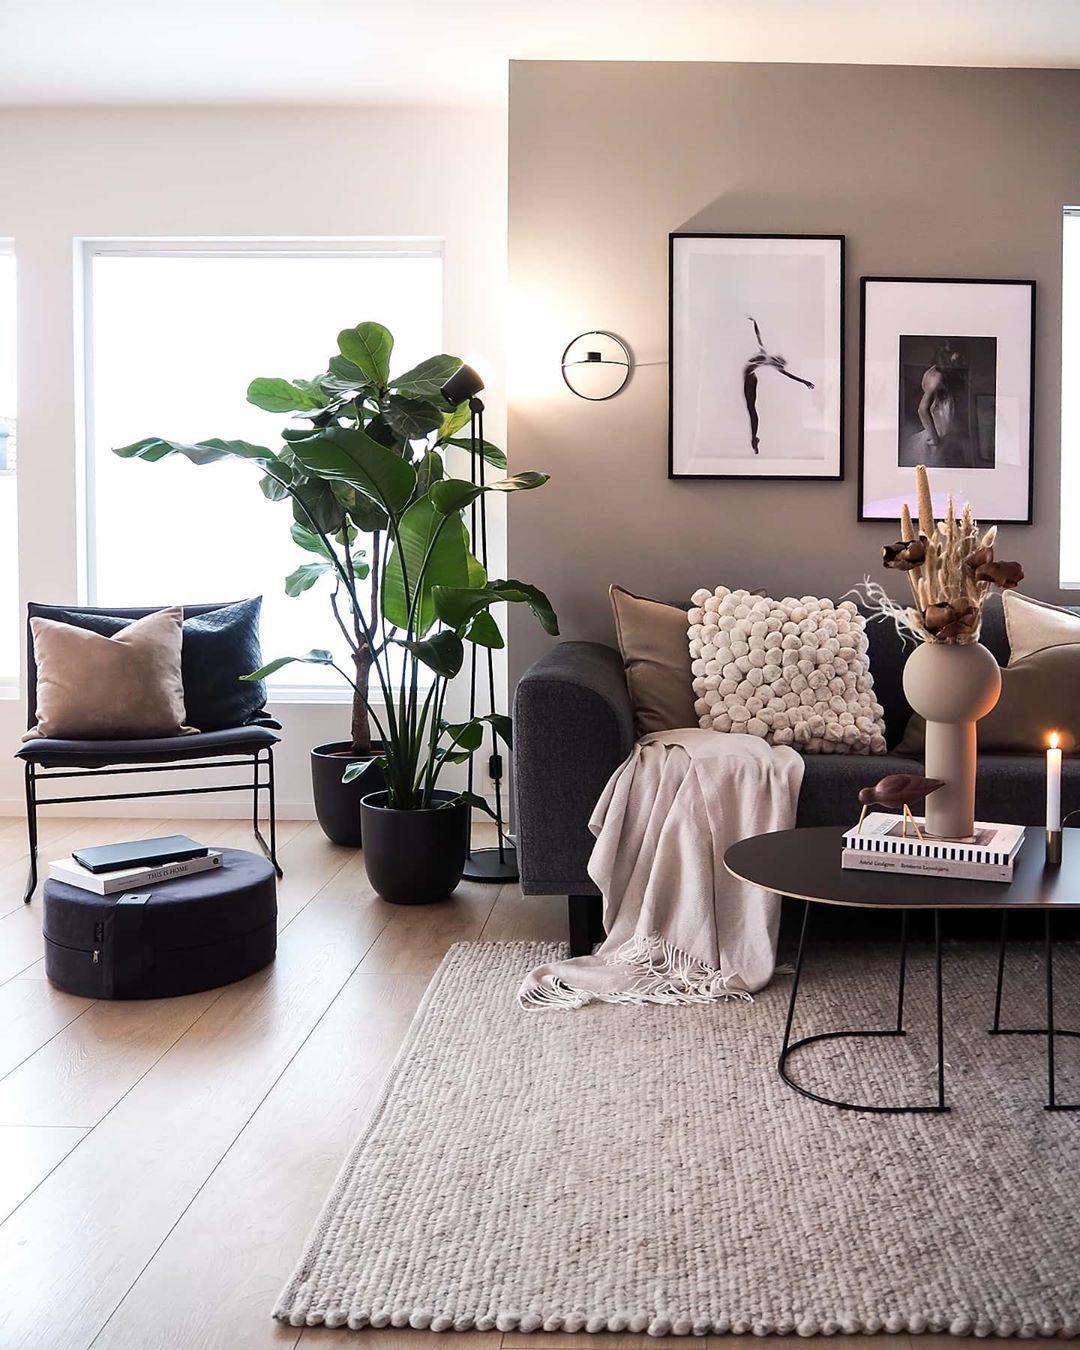 Pin On Home Decor Inspire me home decor living room gif